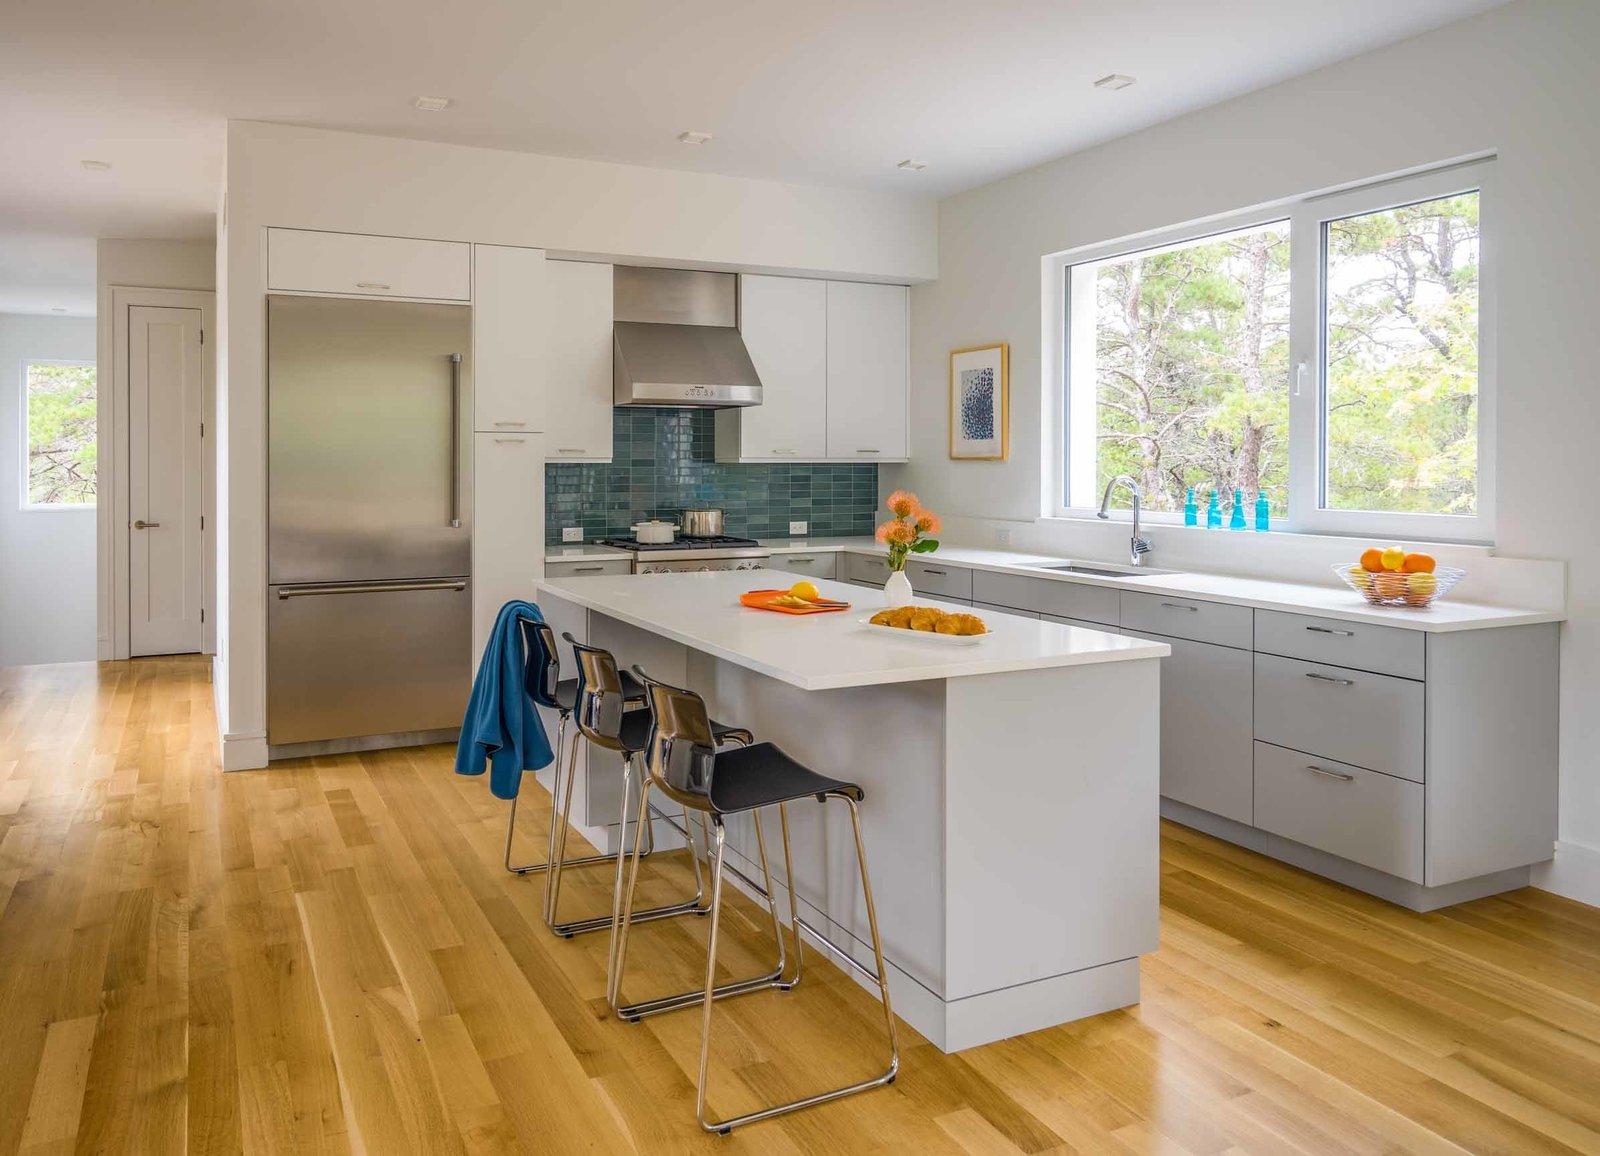 Kitchen, Refrigerator, Range, Medium Hardwood, Glass Tile, Ceiling, and Undermount  Best Kitchen Ceiling Glass Tile Photos from Wellfleet Modern